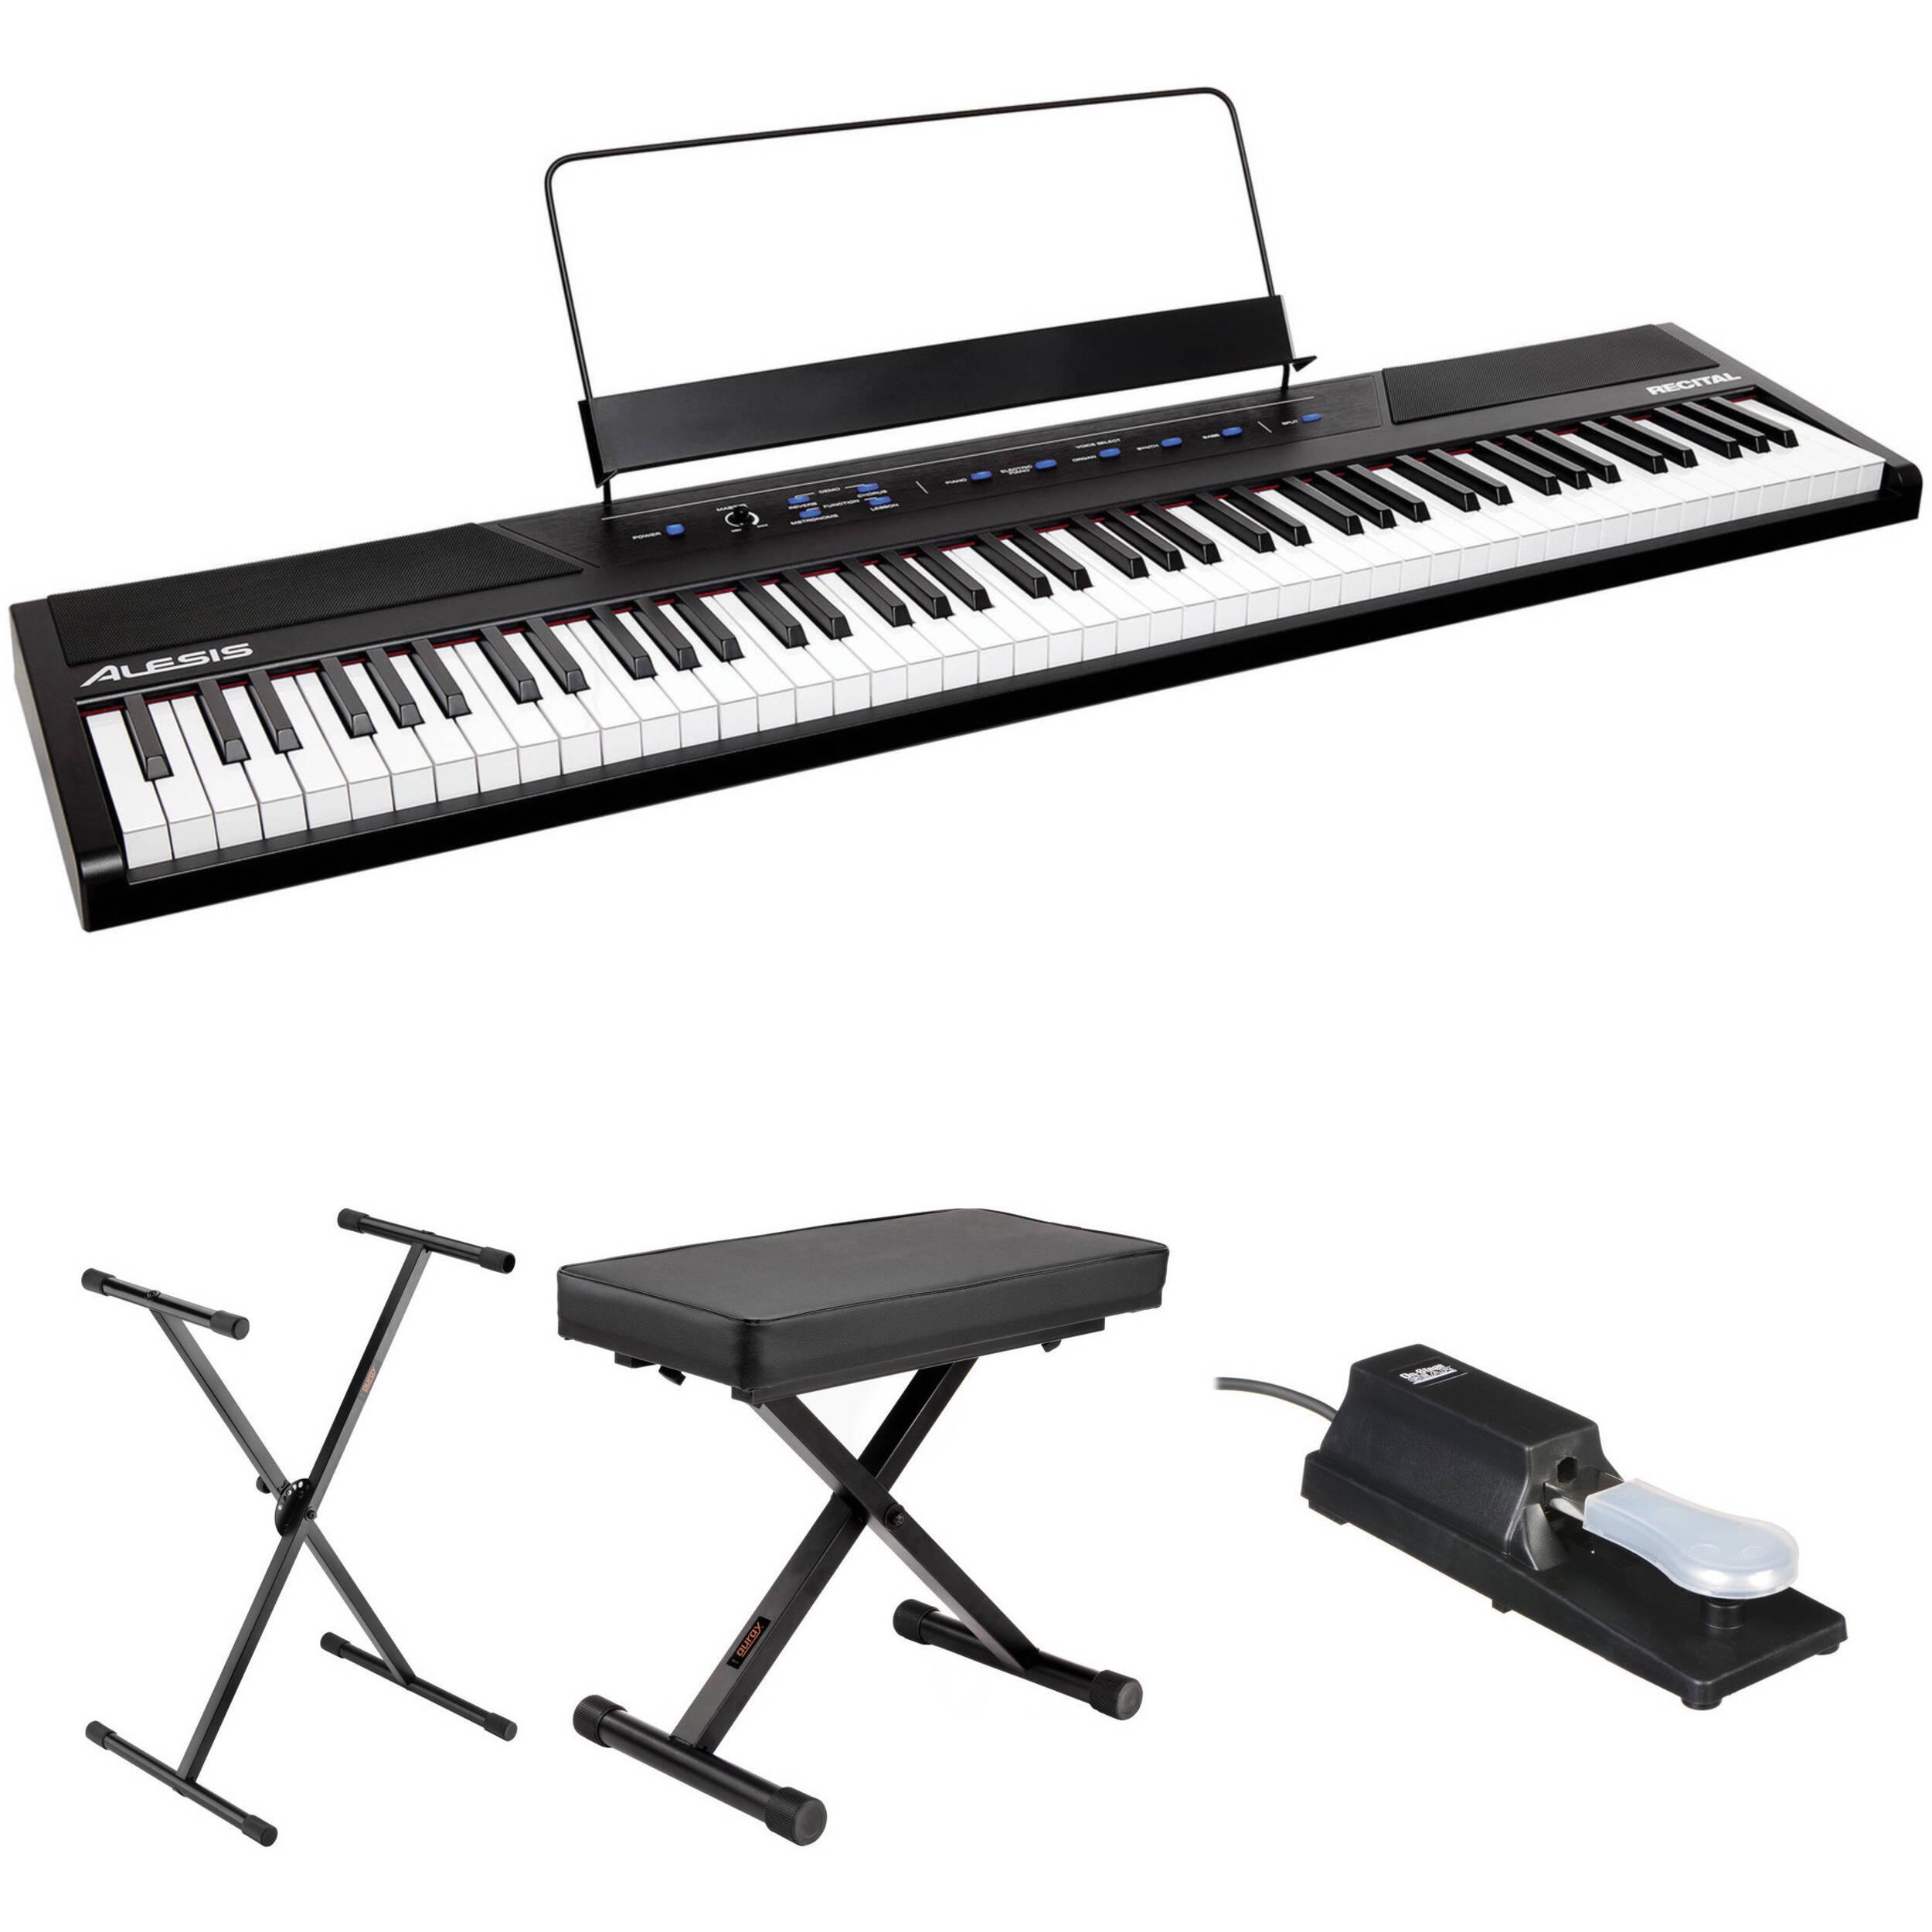 alesis recital 88 key digital piano essentials kit b h photo. Black Bedroom Furniture Sets. Home Design Ideas